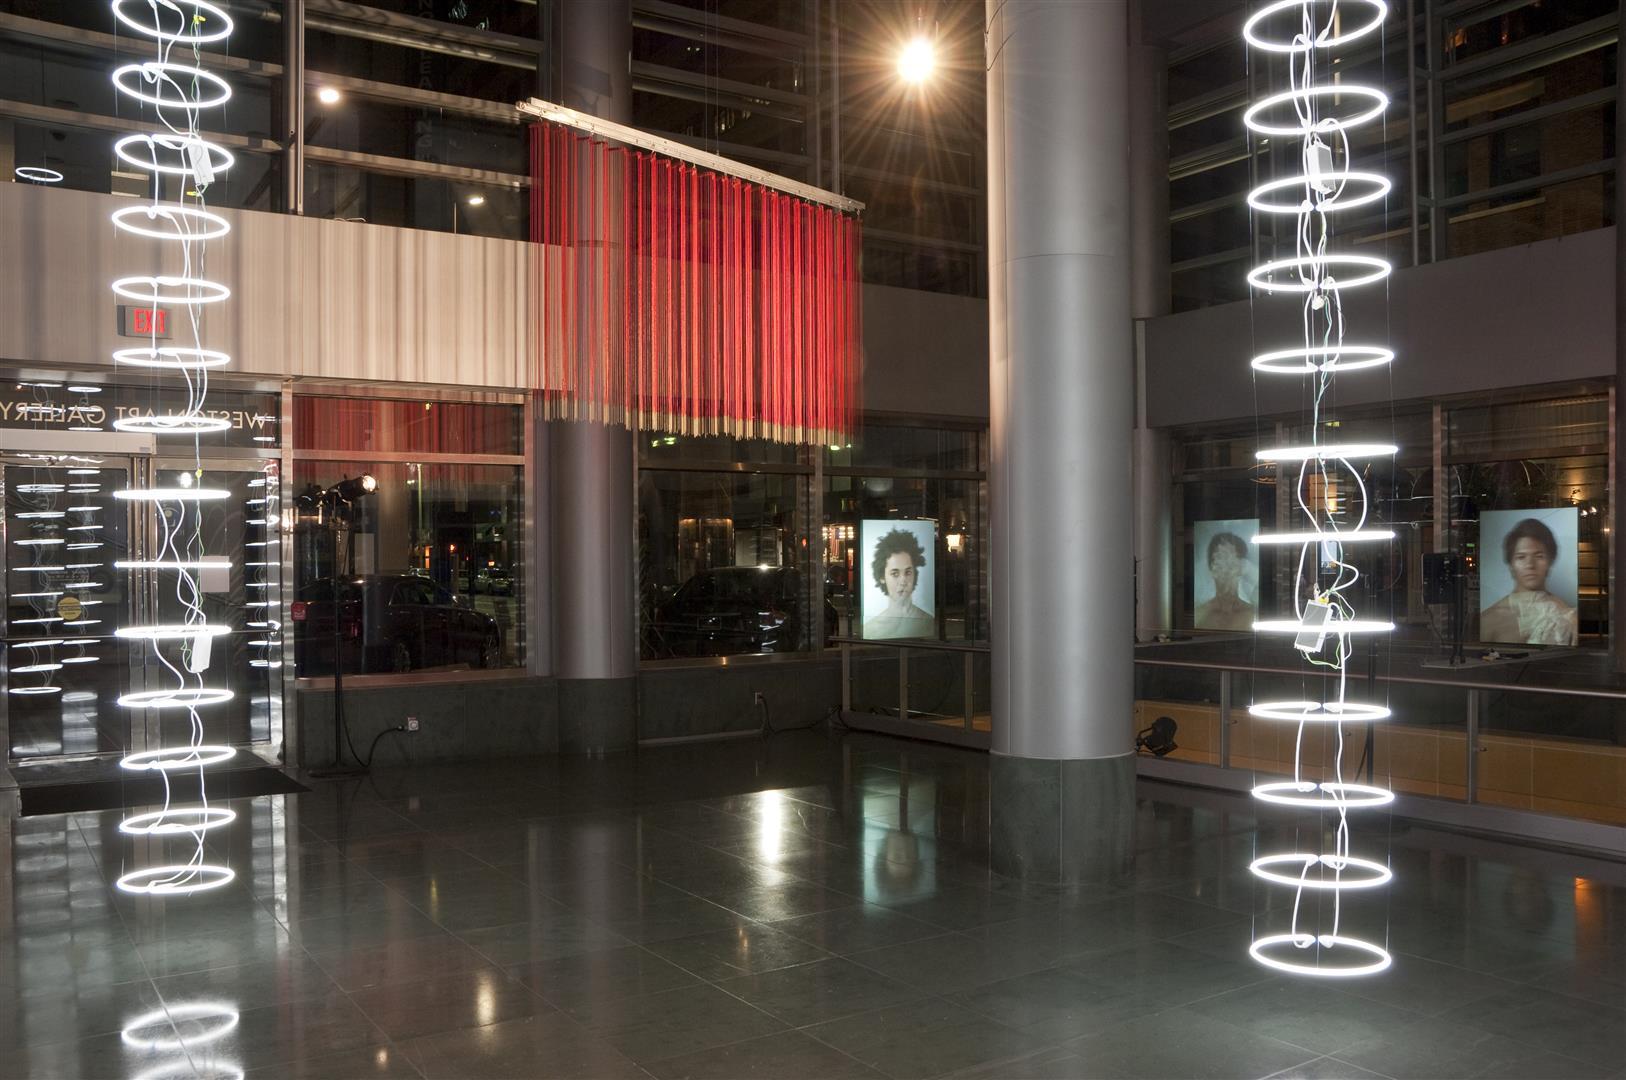 TAINT  - Weston Art Gallery, Cincinnati, Ohio, 2012 / upper gallery installation